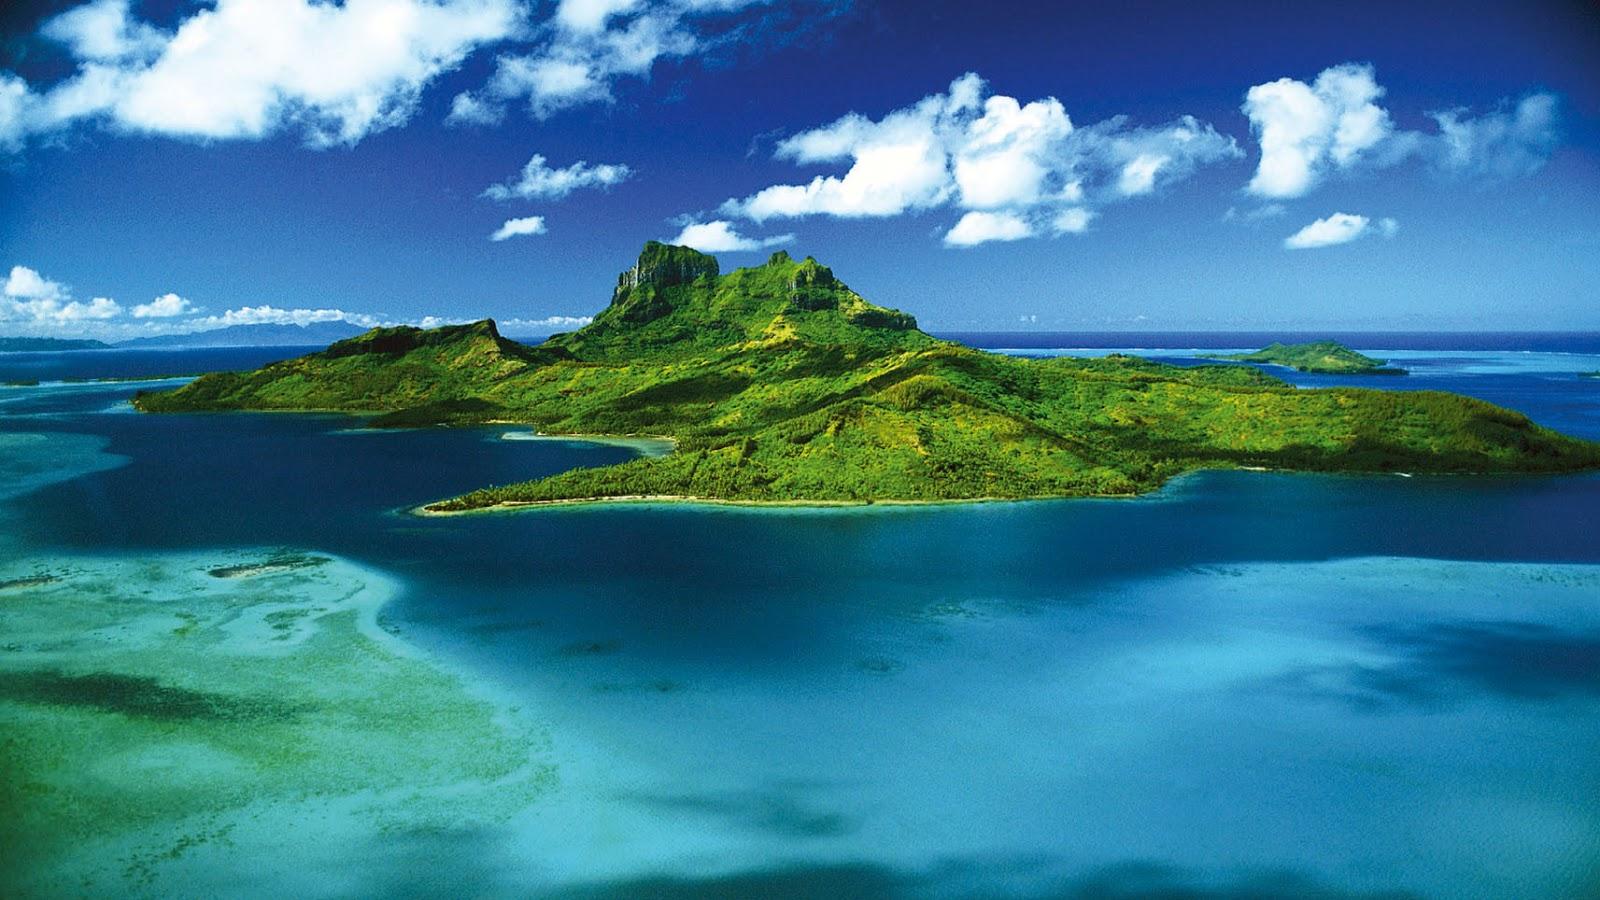 essays on gallapagos islands